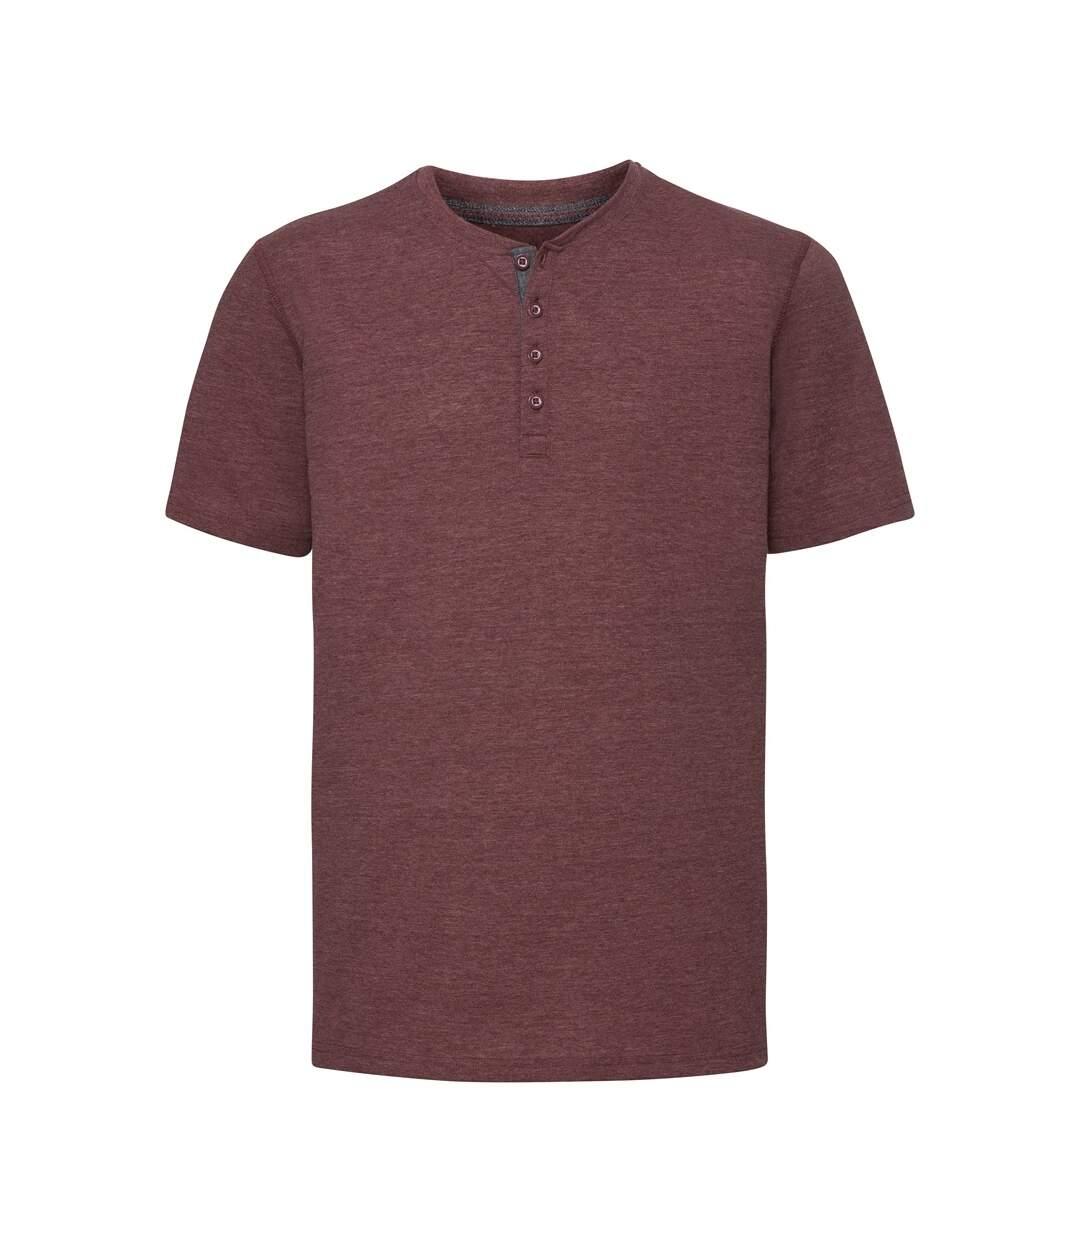 Russell - T-shirt manches courtes HENLEY - Homme (Bordeaux chiné) - UTPC3636